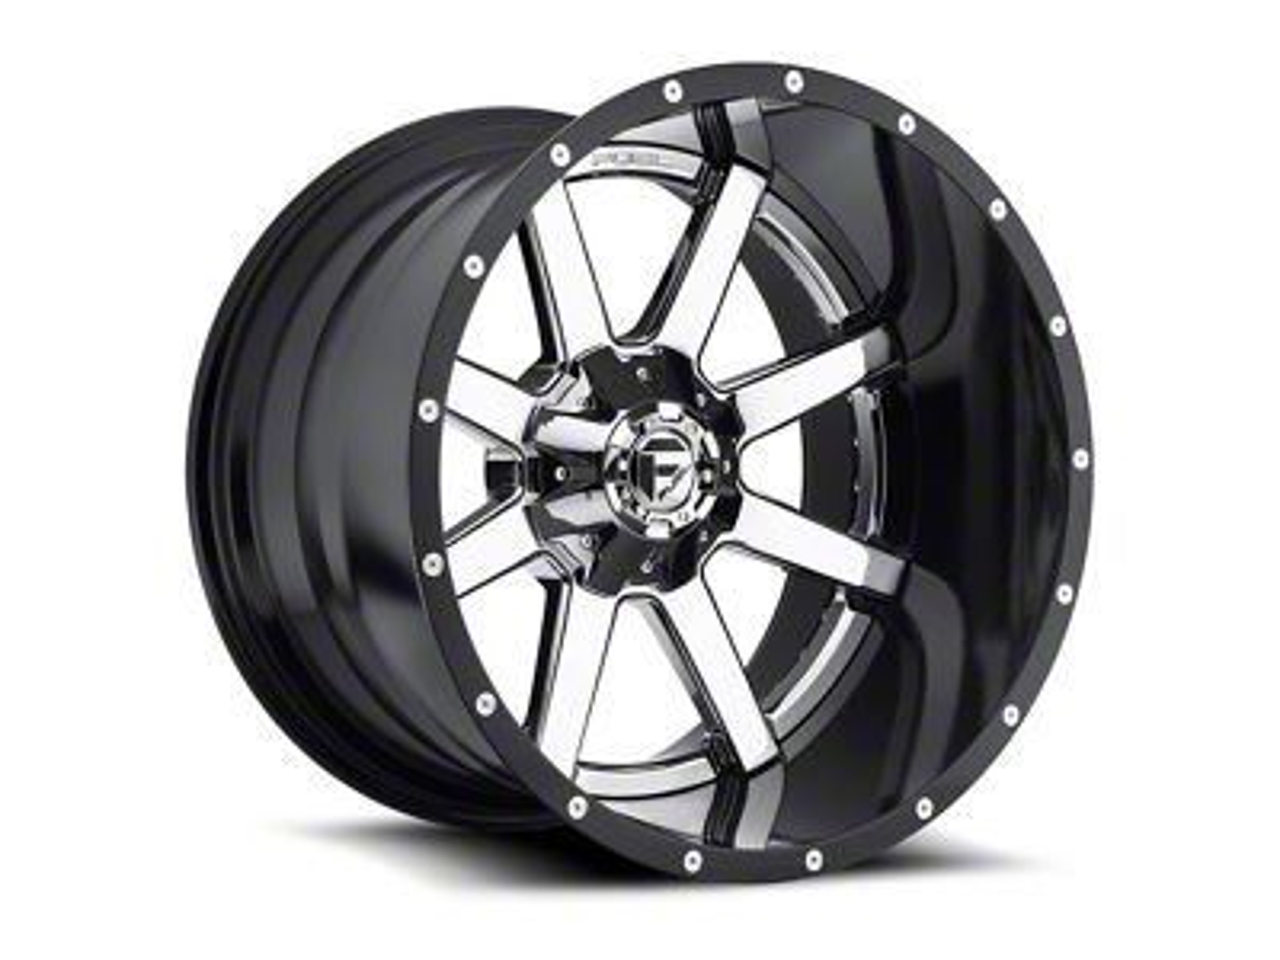 Fuel Wheels Maverick 2-Piece Chrome 5-Lug Wheel - 20x12 (02-18 RAM 1500, Excluding Mega Cab)